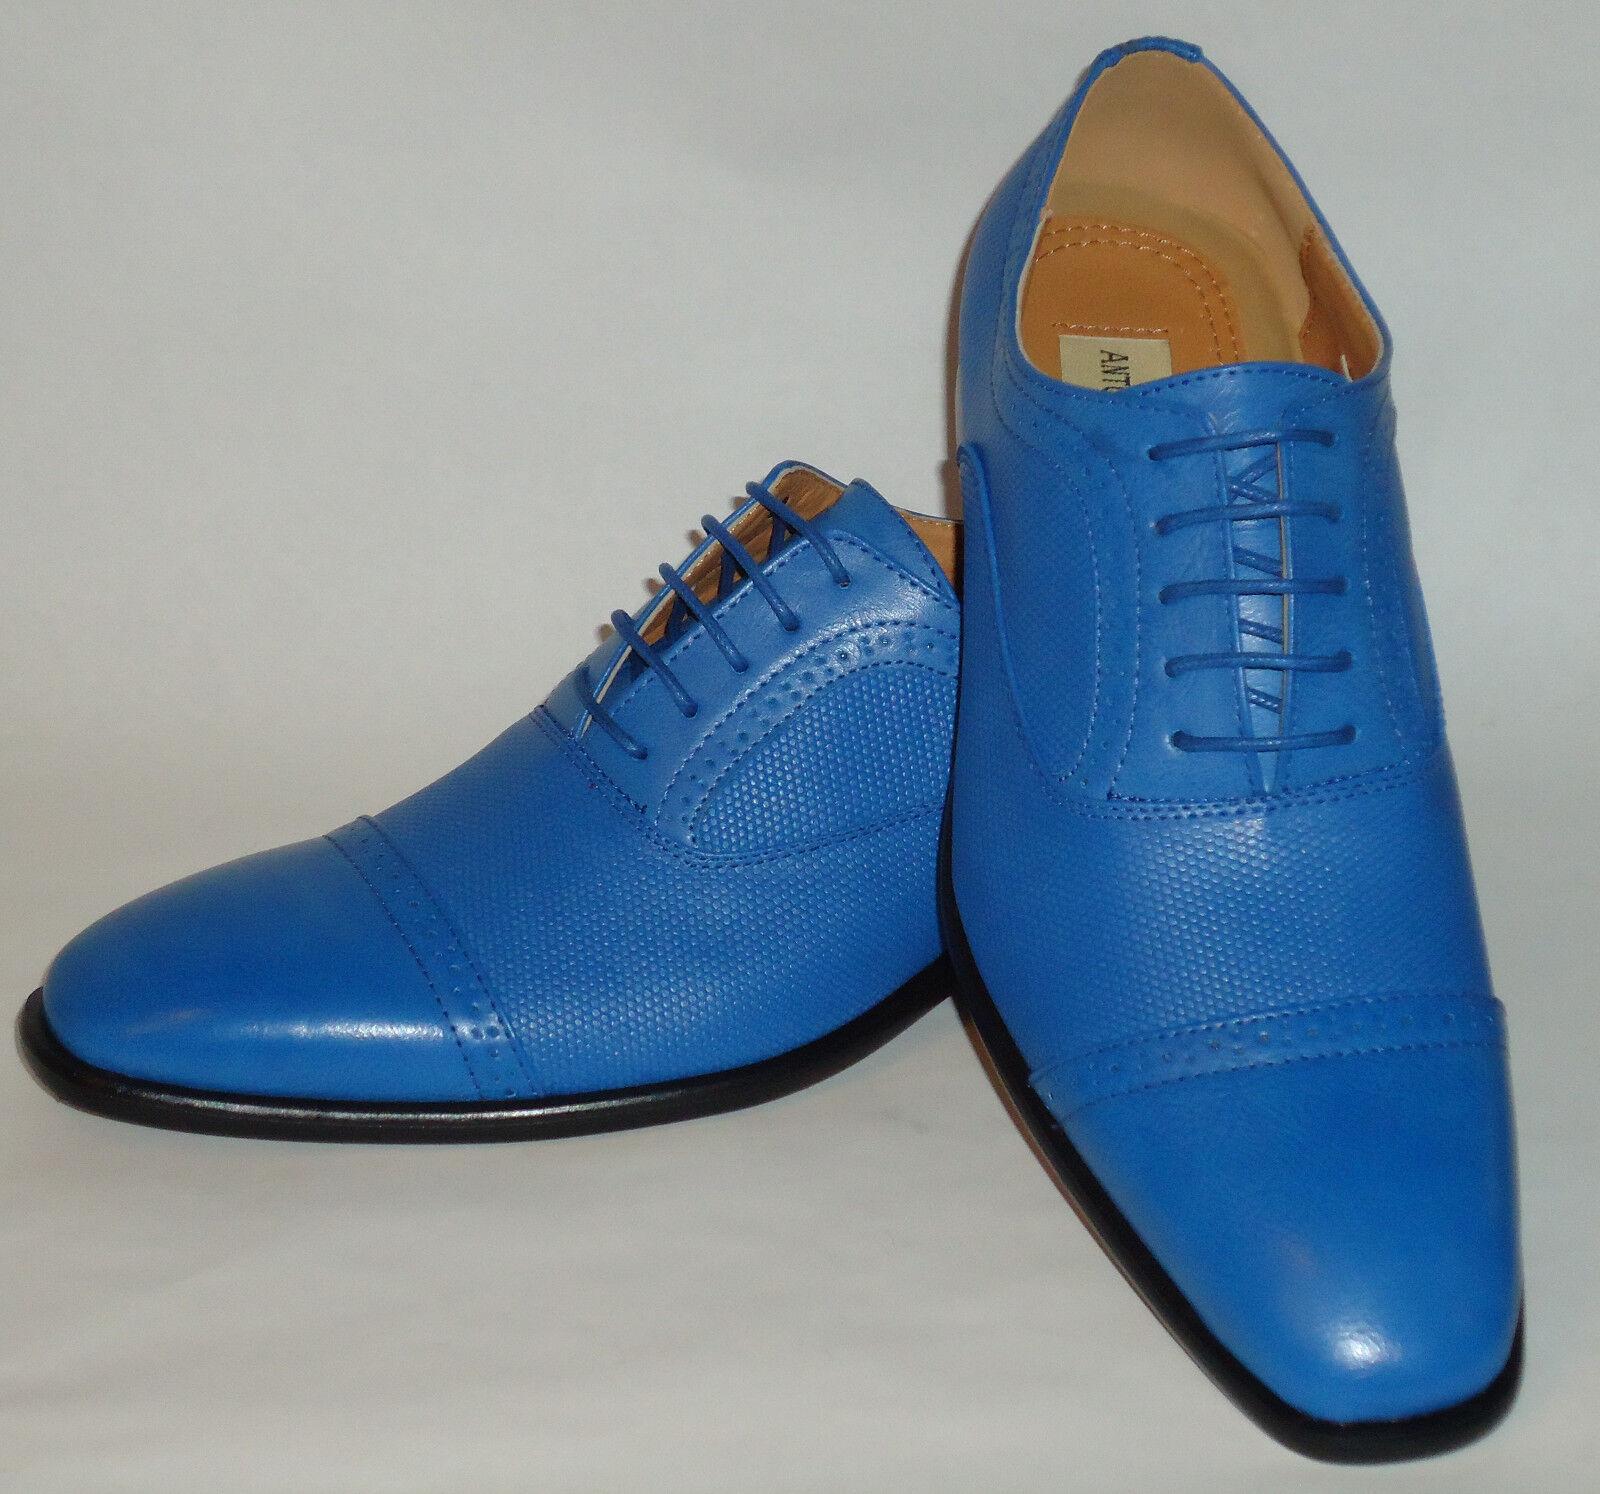 Mens Fashionable New Design Bright Blau Dress schuhe Antonio Cerrelli 6694